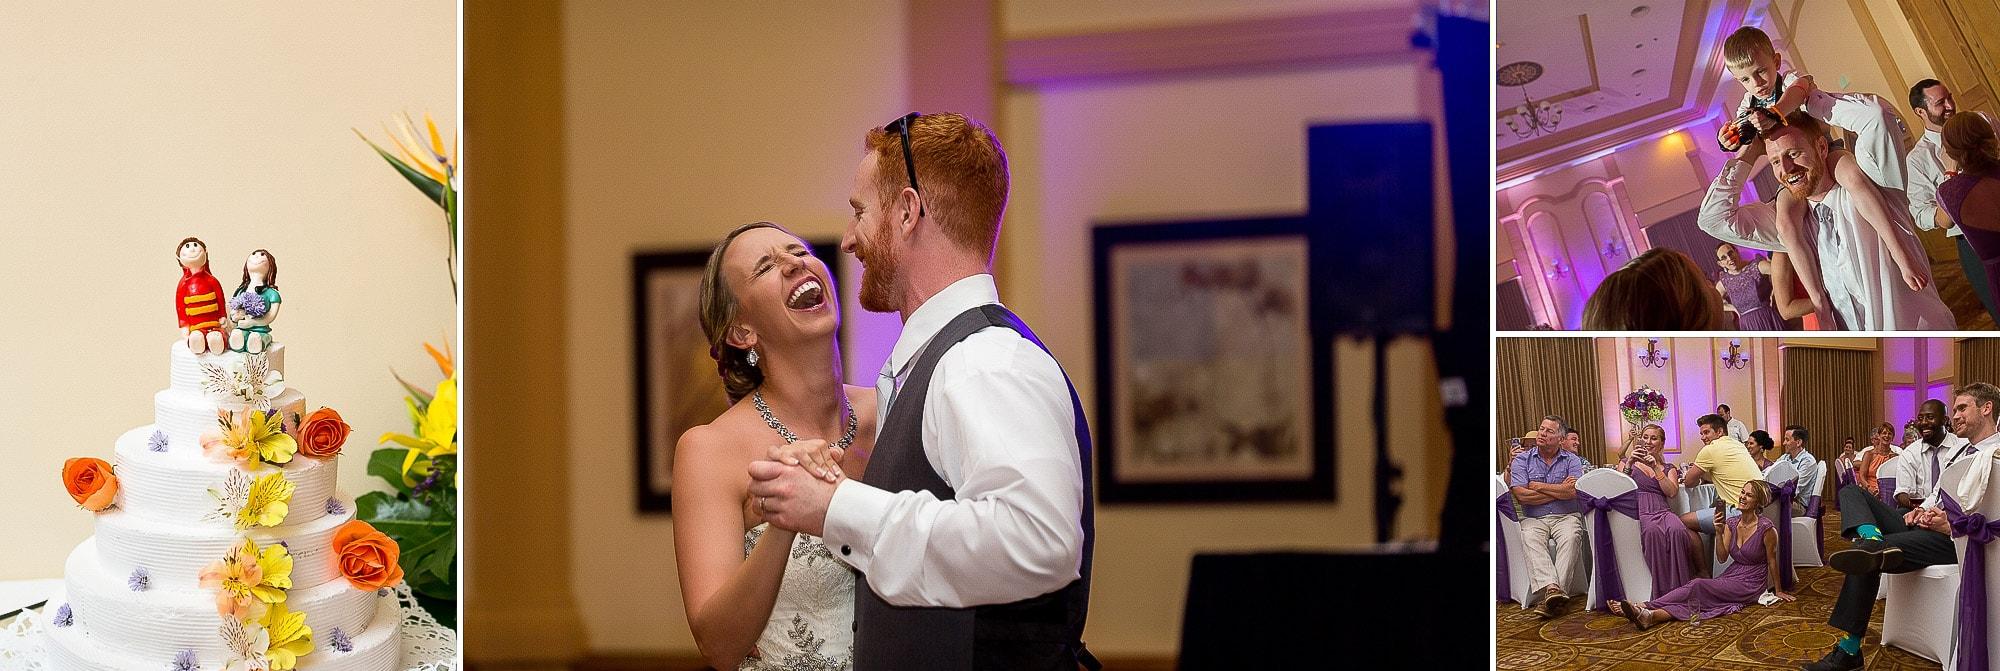 wedding reception at riu palace costa rica